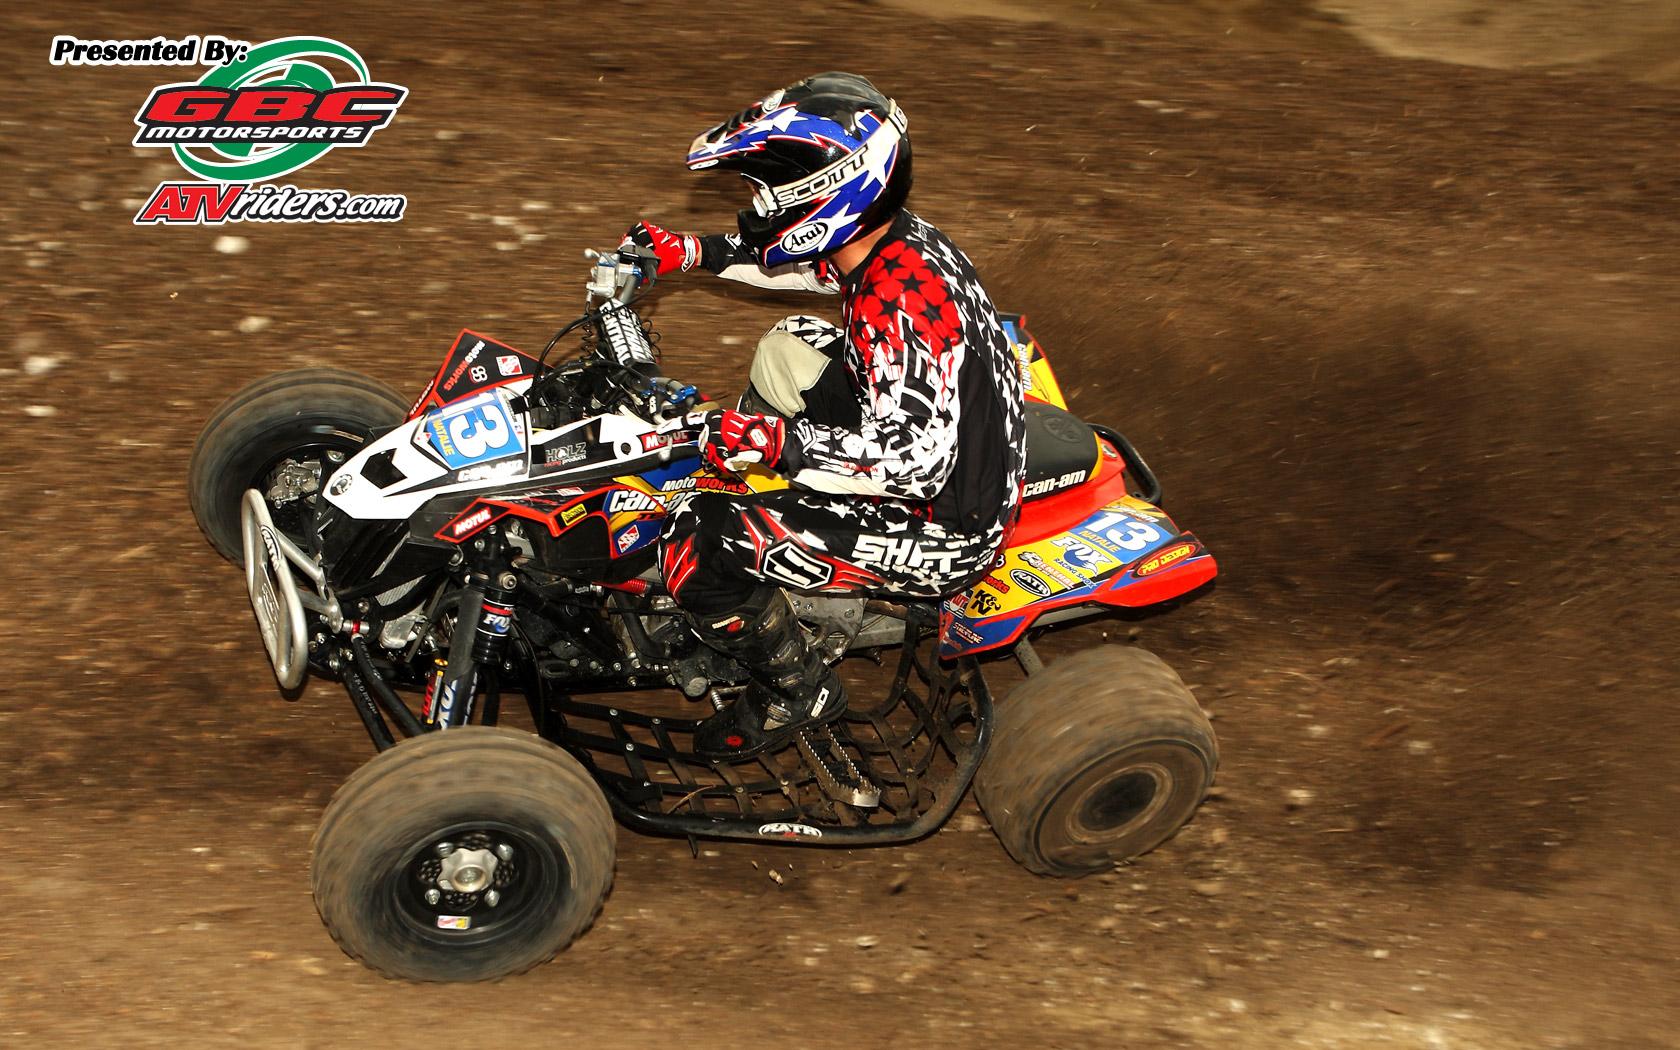 Fox Shoxs 13 John Natalie   AMA ATV Motocross Pro ATV Racer 1680x1050